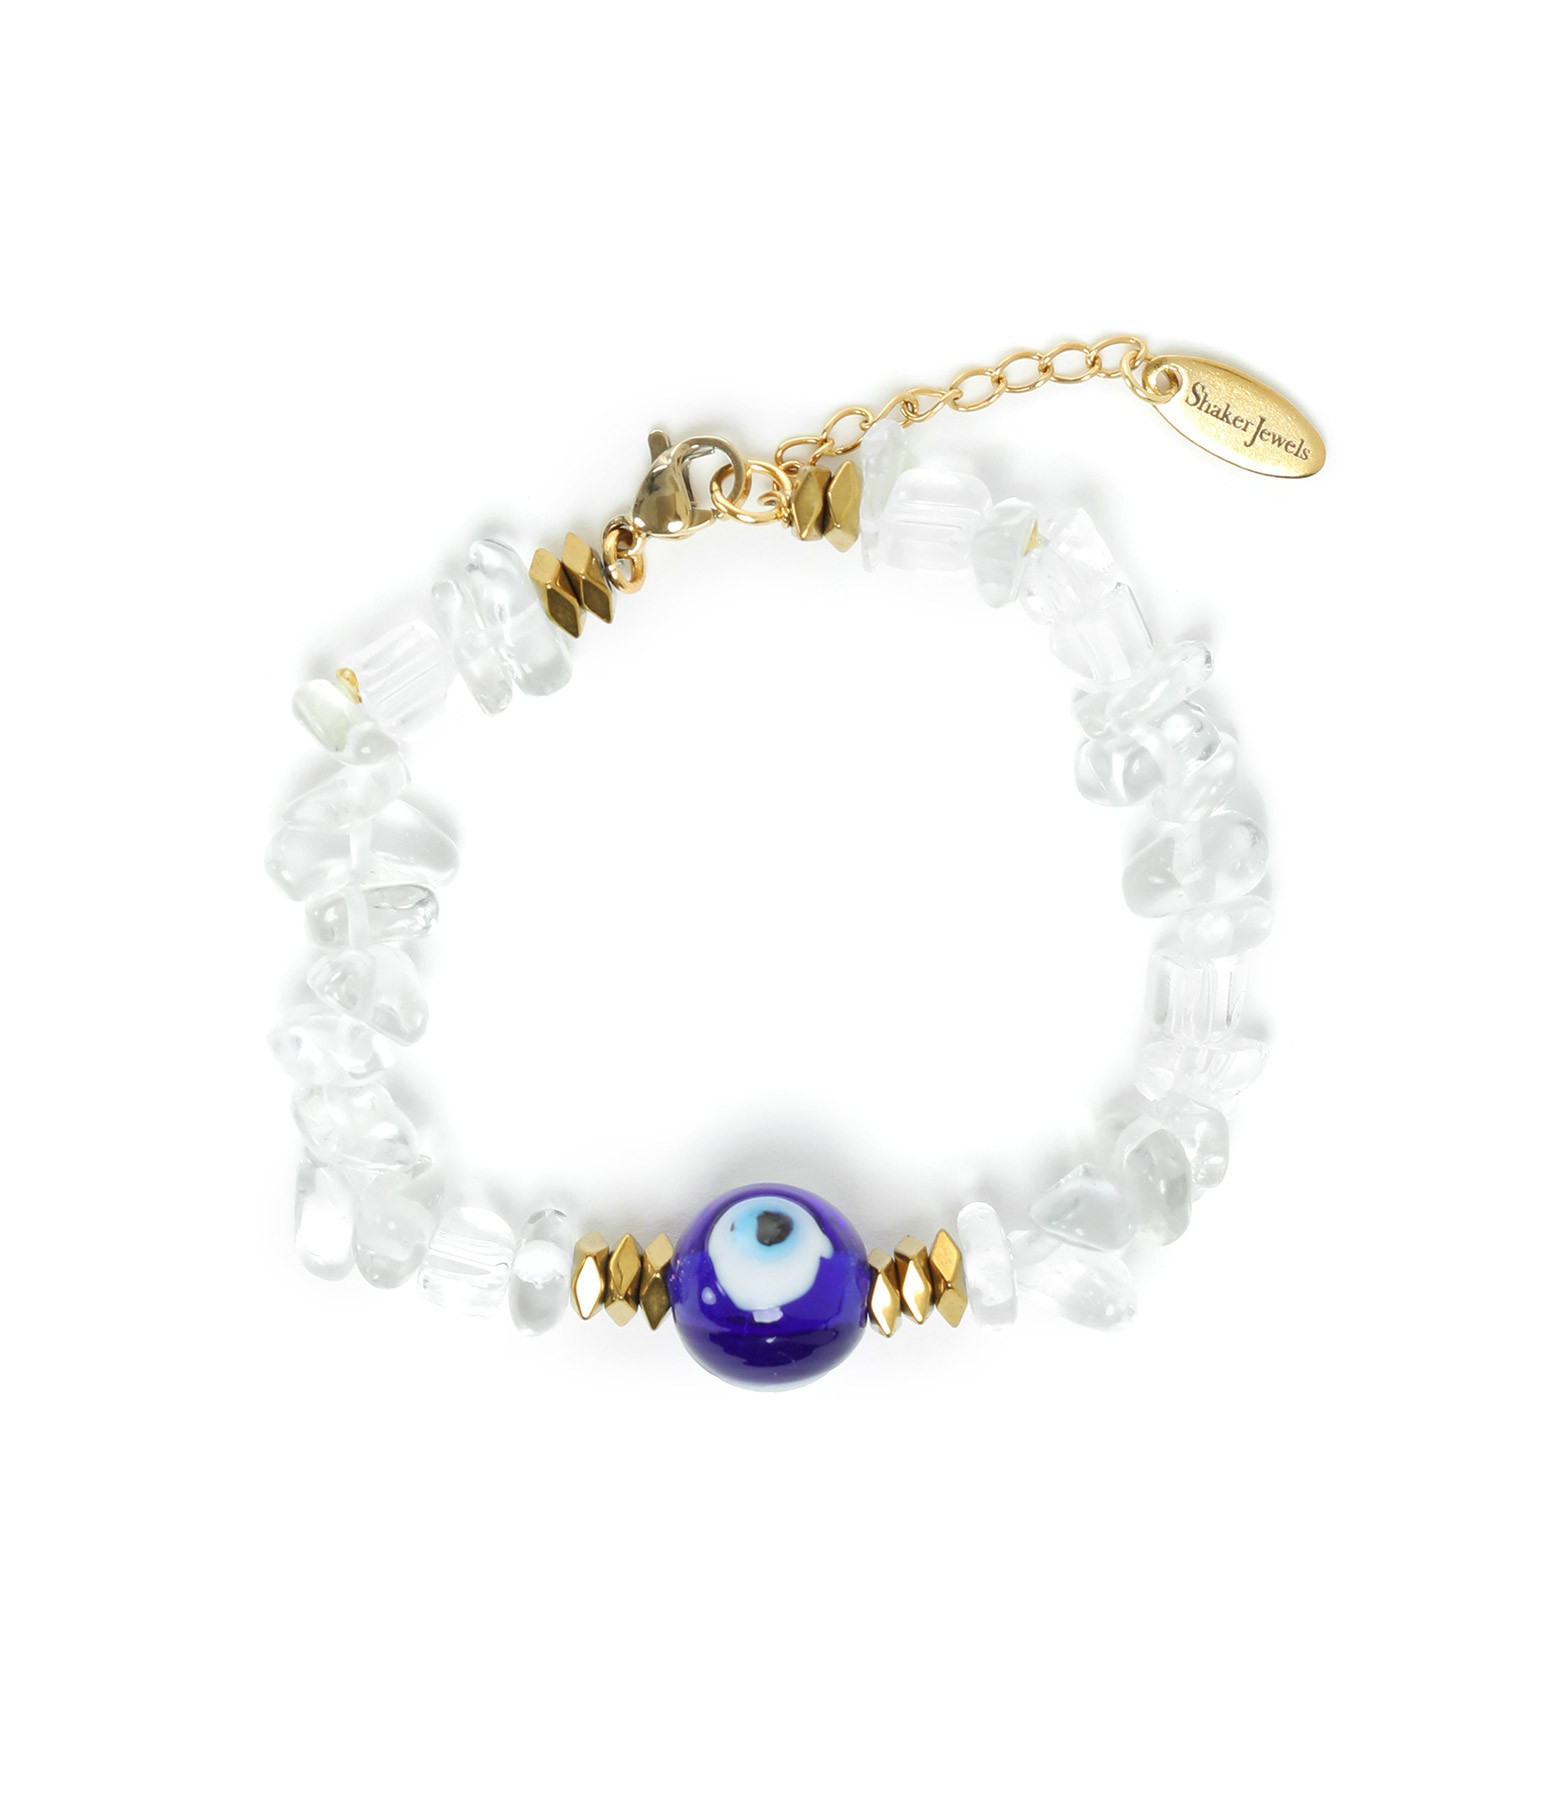 SHAKER JEWELS - Bracelet Eye Pierres Transparentes